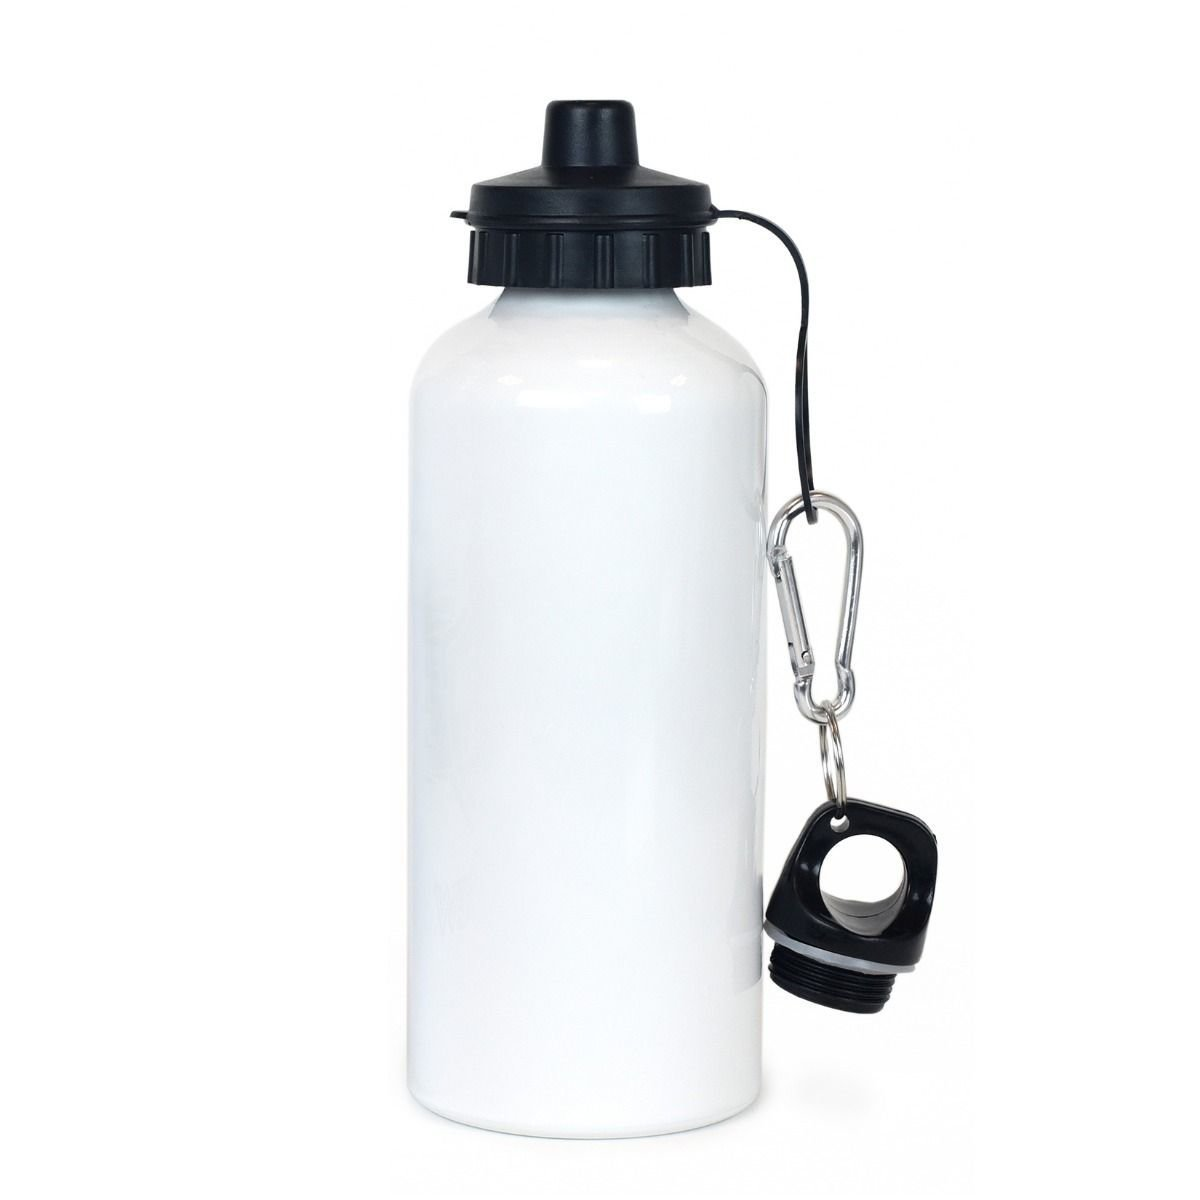 White Aluminum Liquid Bottle - 600mL Personalized Free Shipping